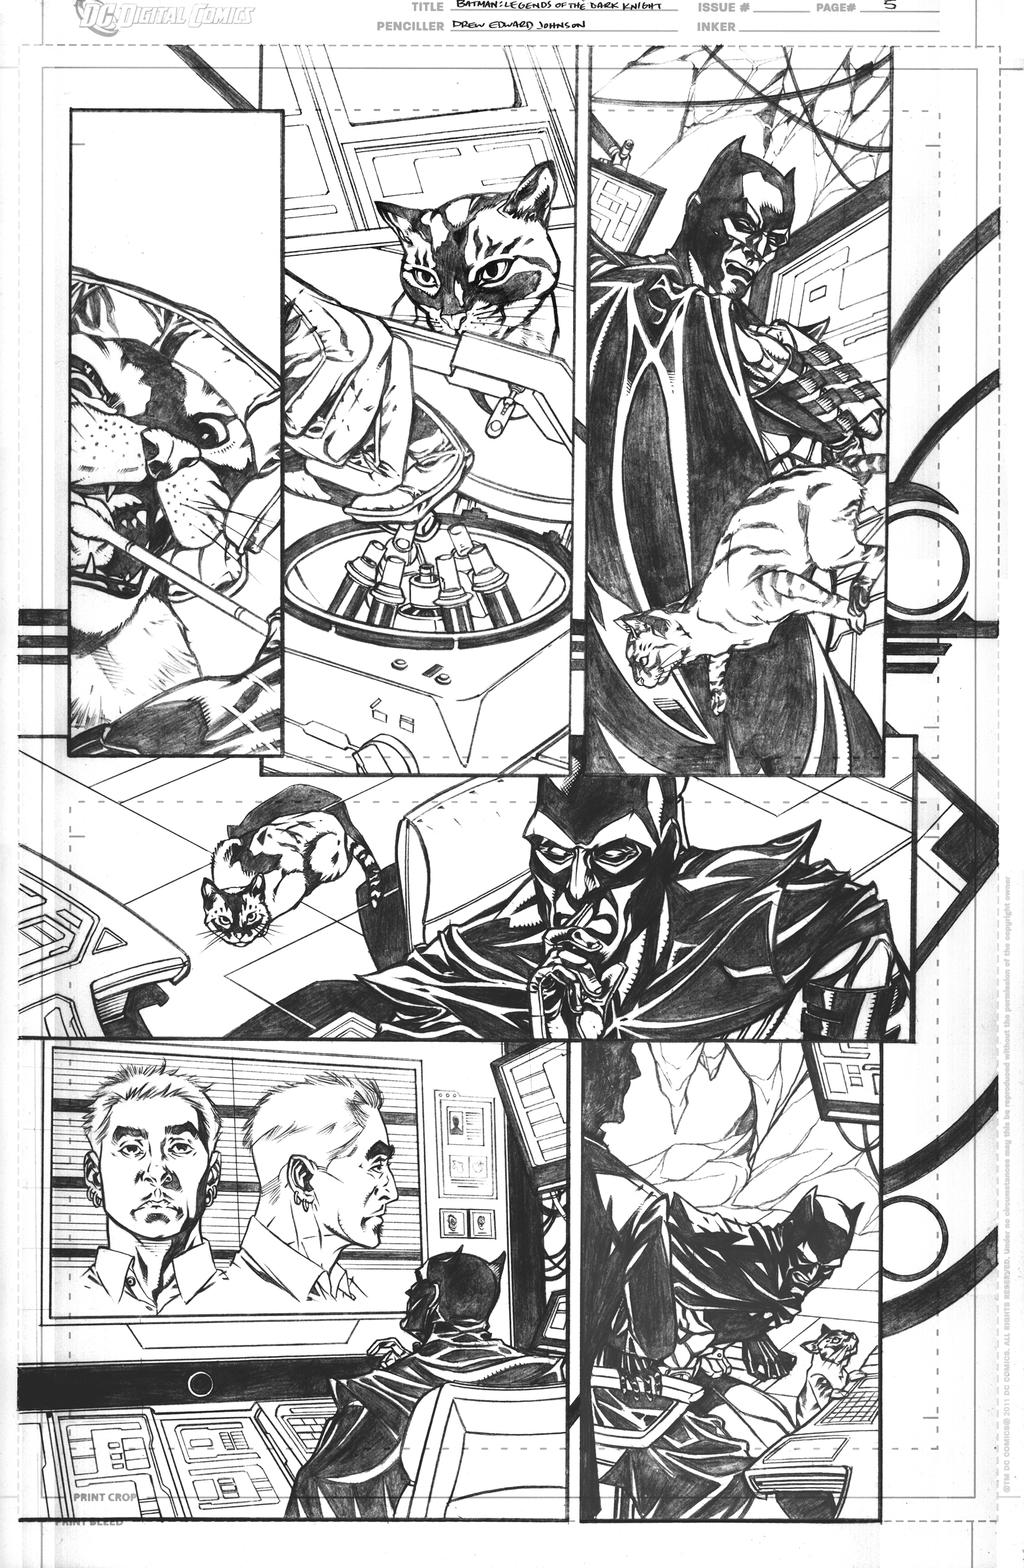 Legends of The Dark Knight 59 Page 5 by DrewEdwardJohnson